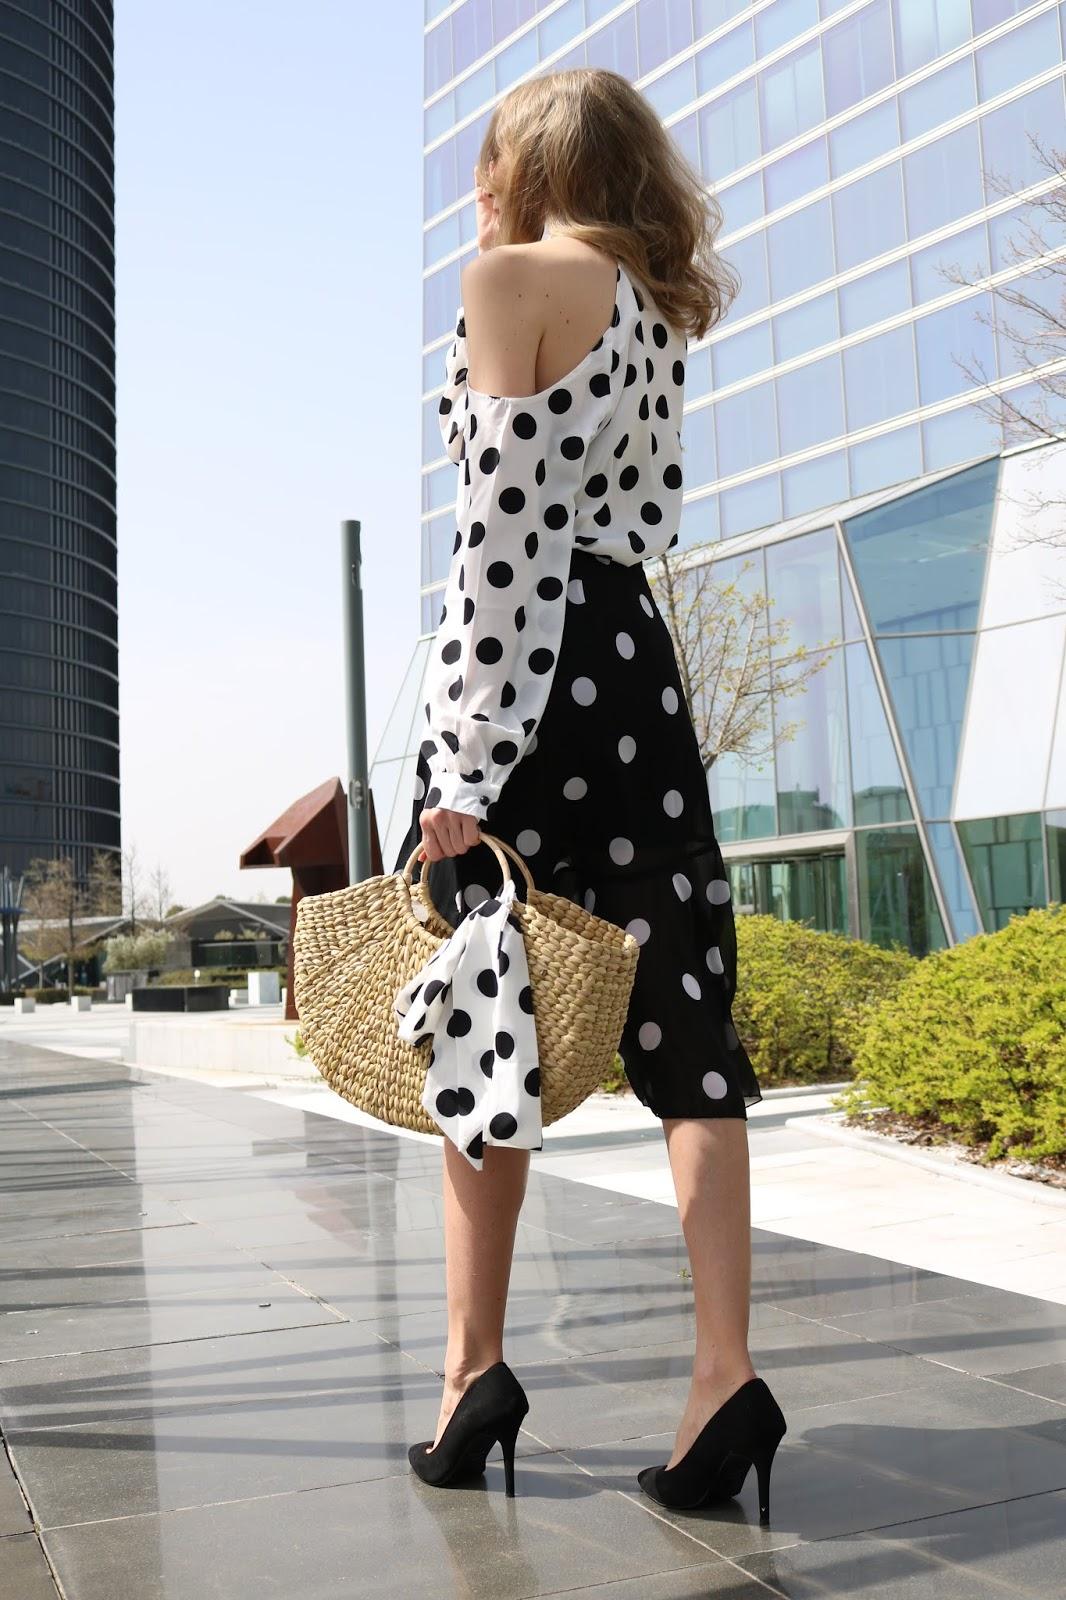 polka-dots-street-style-midi-skirt-nakd-shein-zara-raffia-bag